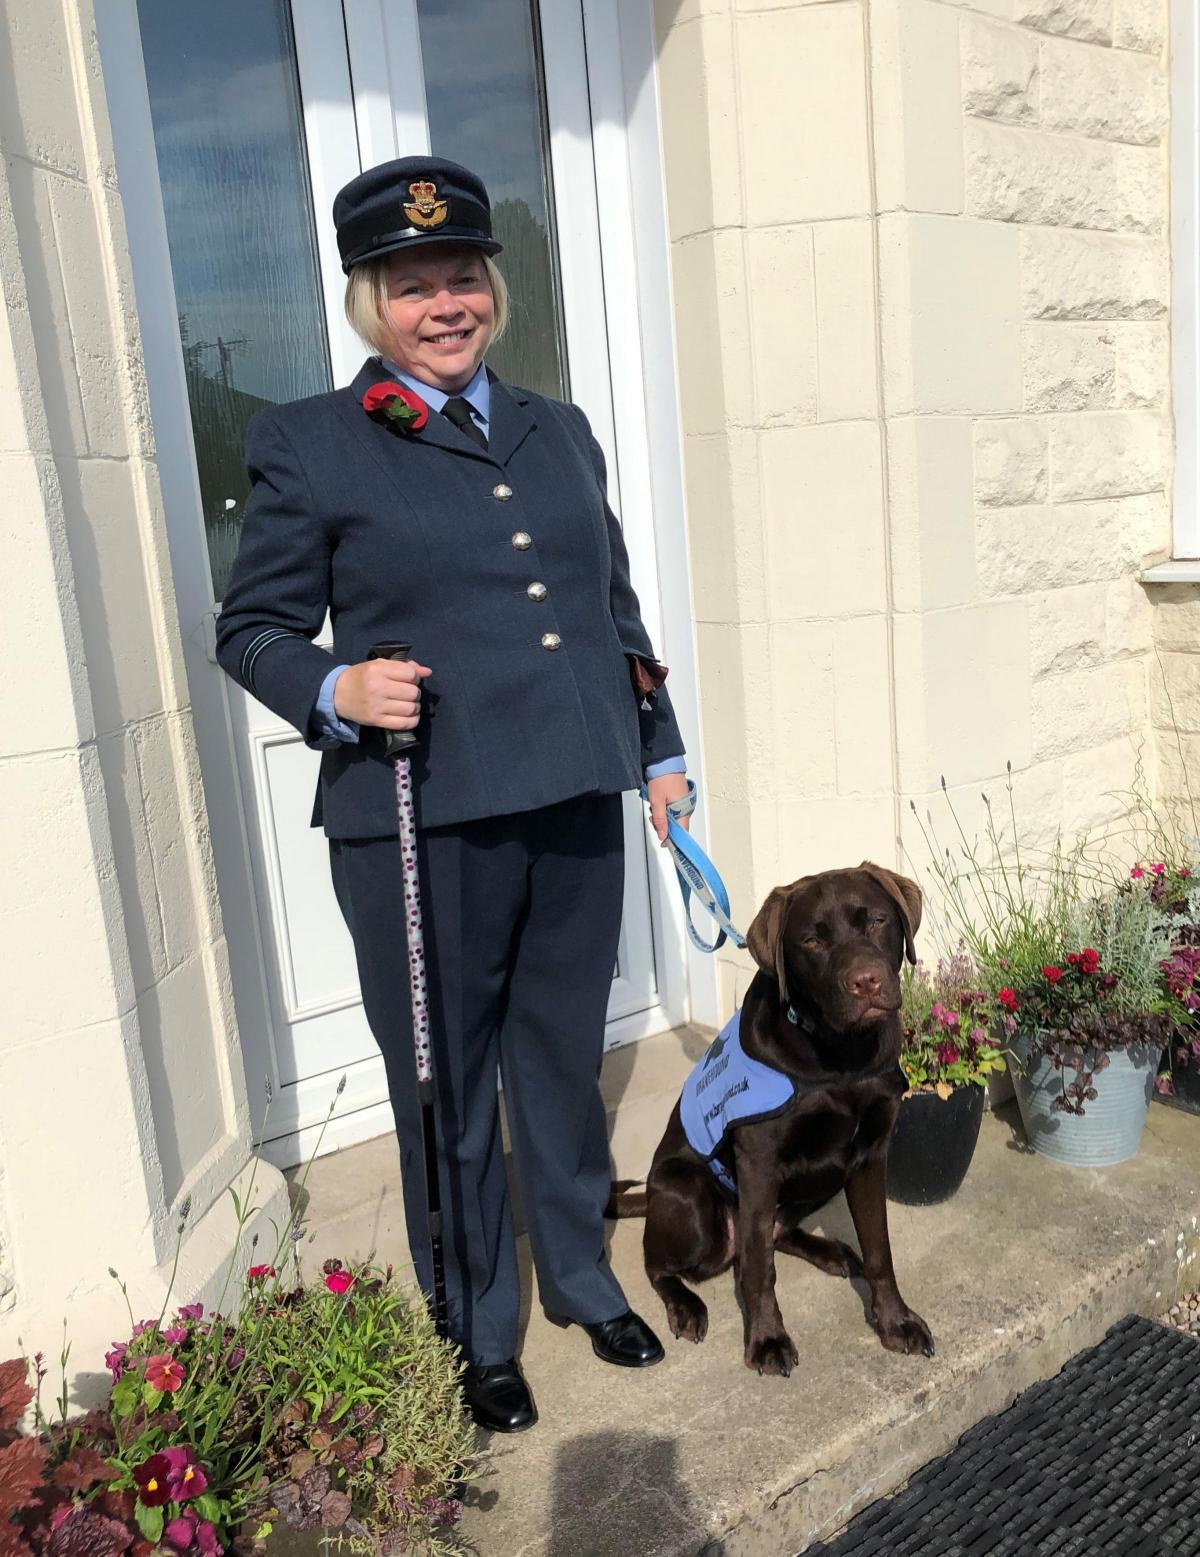 army lady with dog